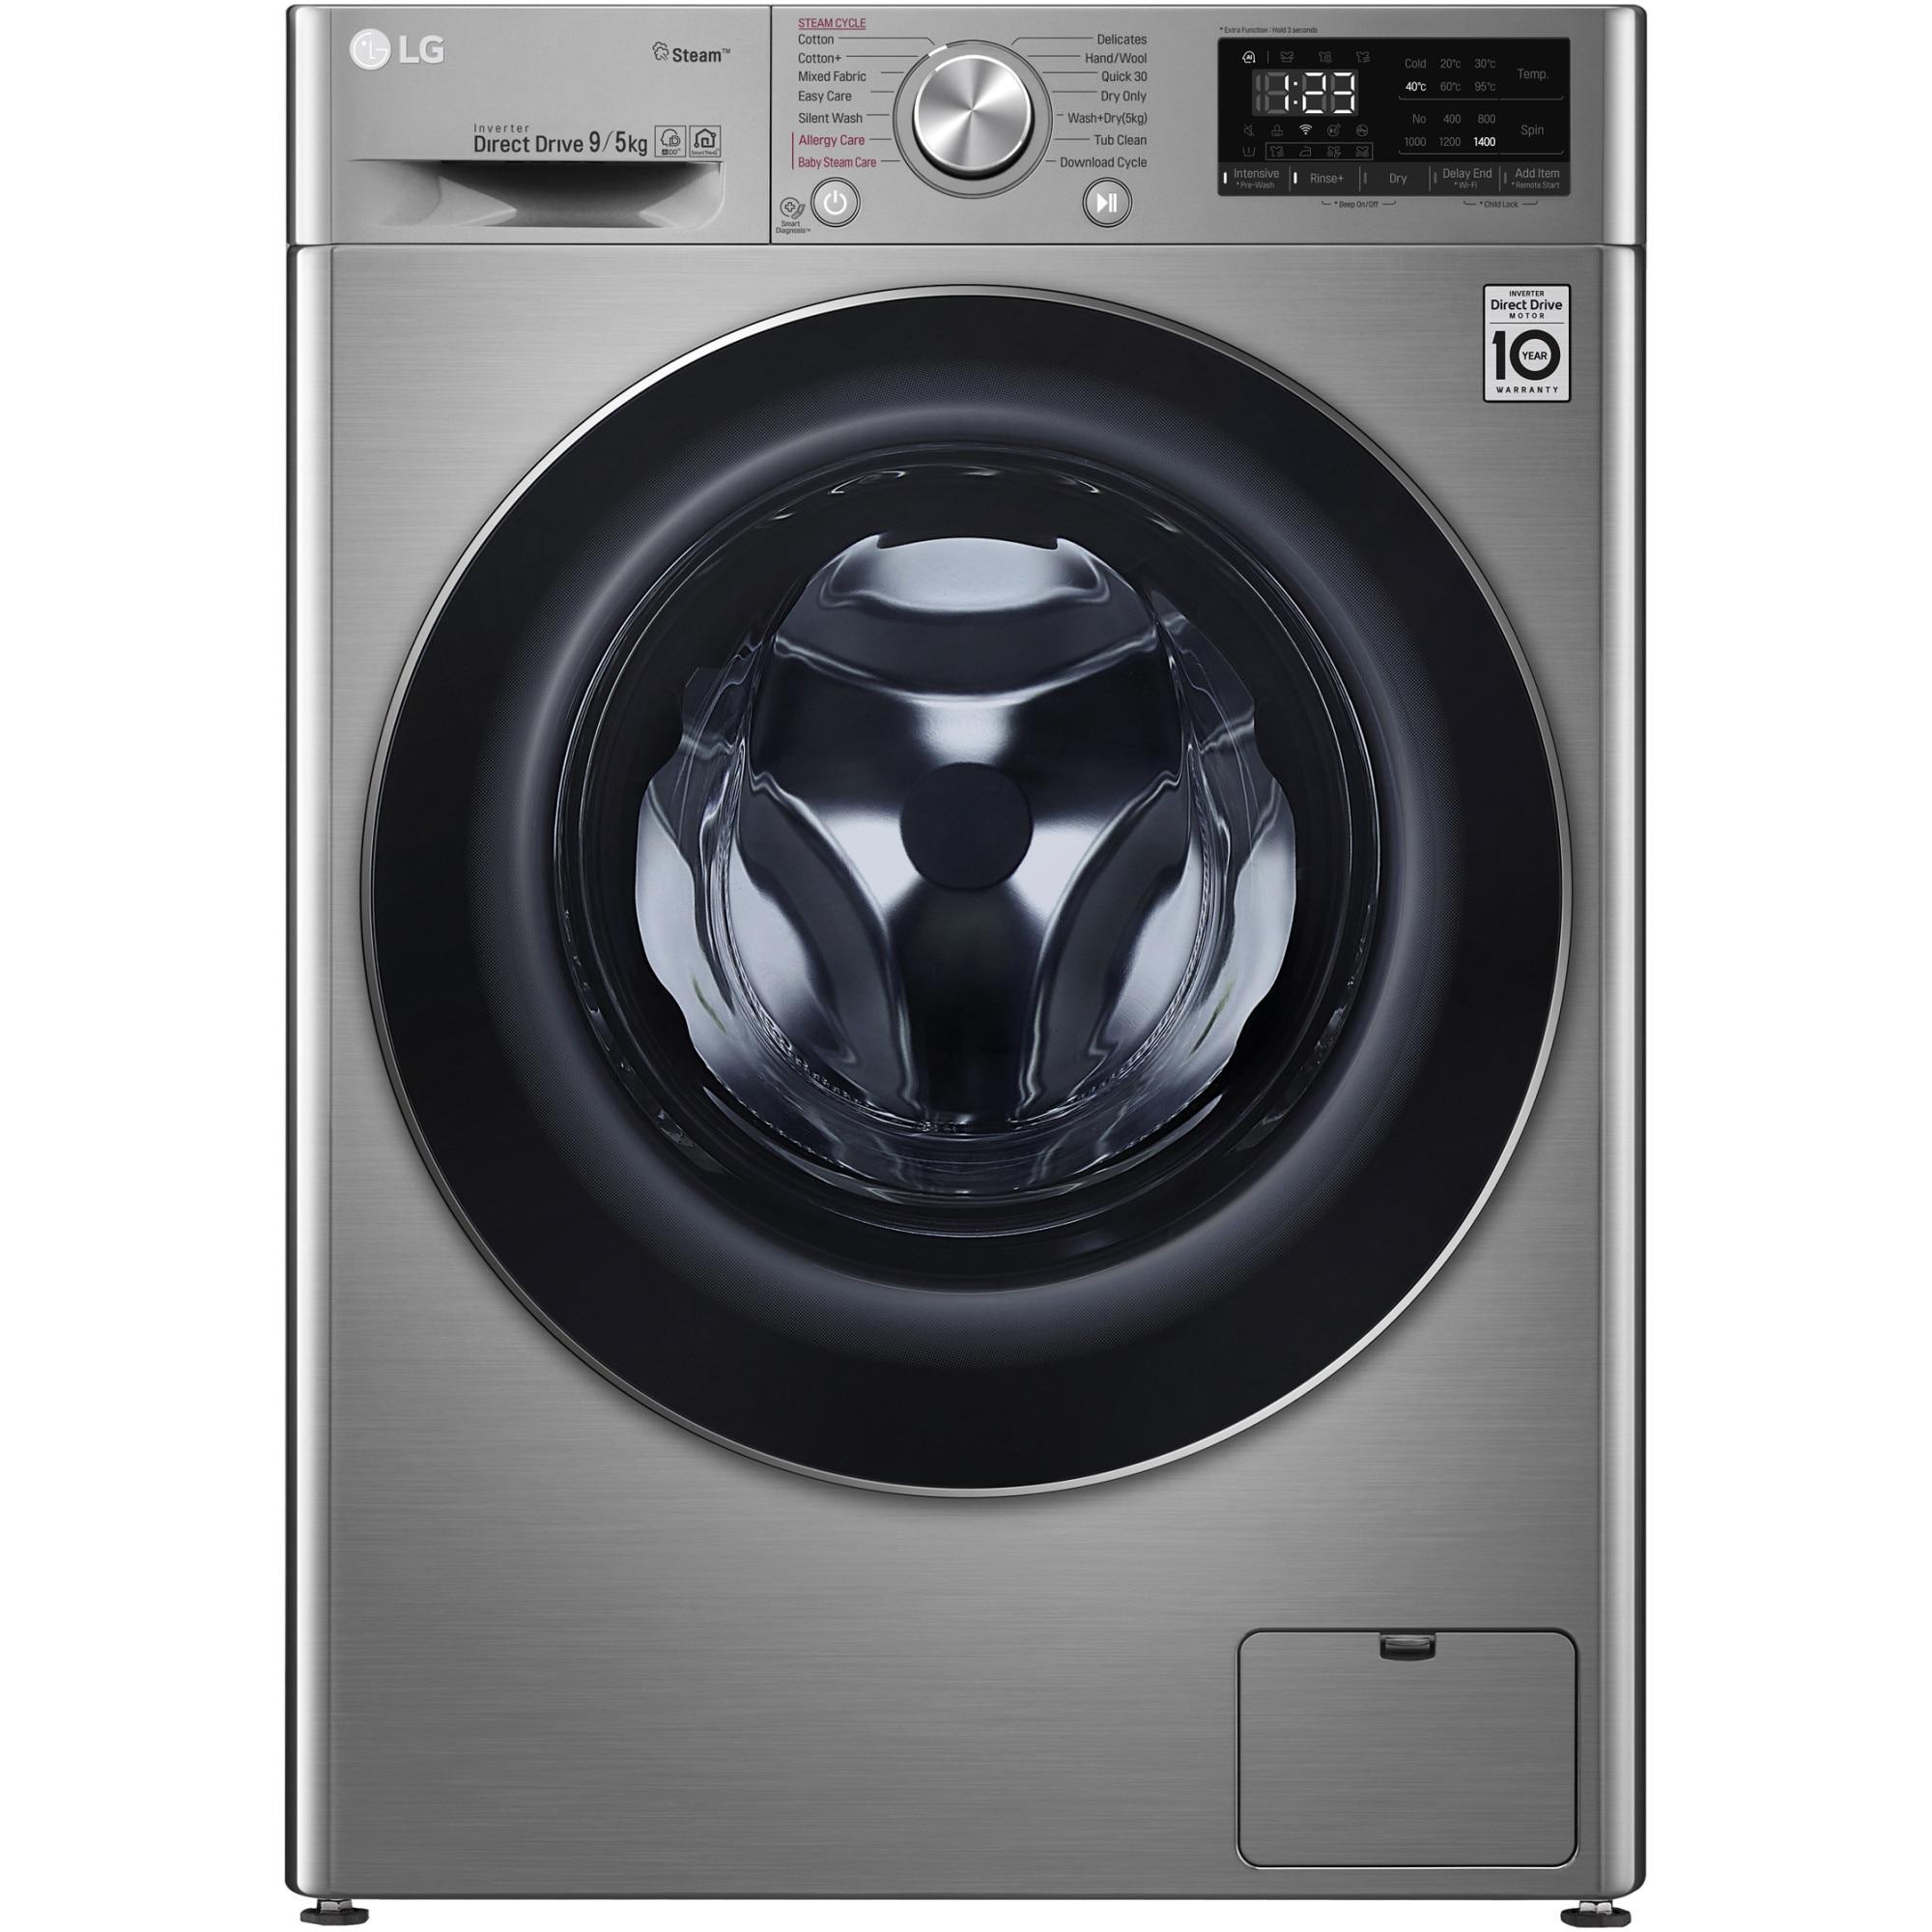 Fotografie Masina de spalat rufe cu uscator LG F4DN409S2T, 1400 RPM, Spalare 9 kg / Uscare 5 kg, Clasa D, Motor AI Direct Drive, Smart Diagnosis, Spa Steam, WiFi, Argintiu